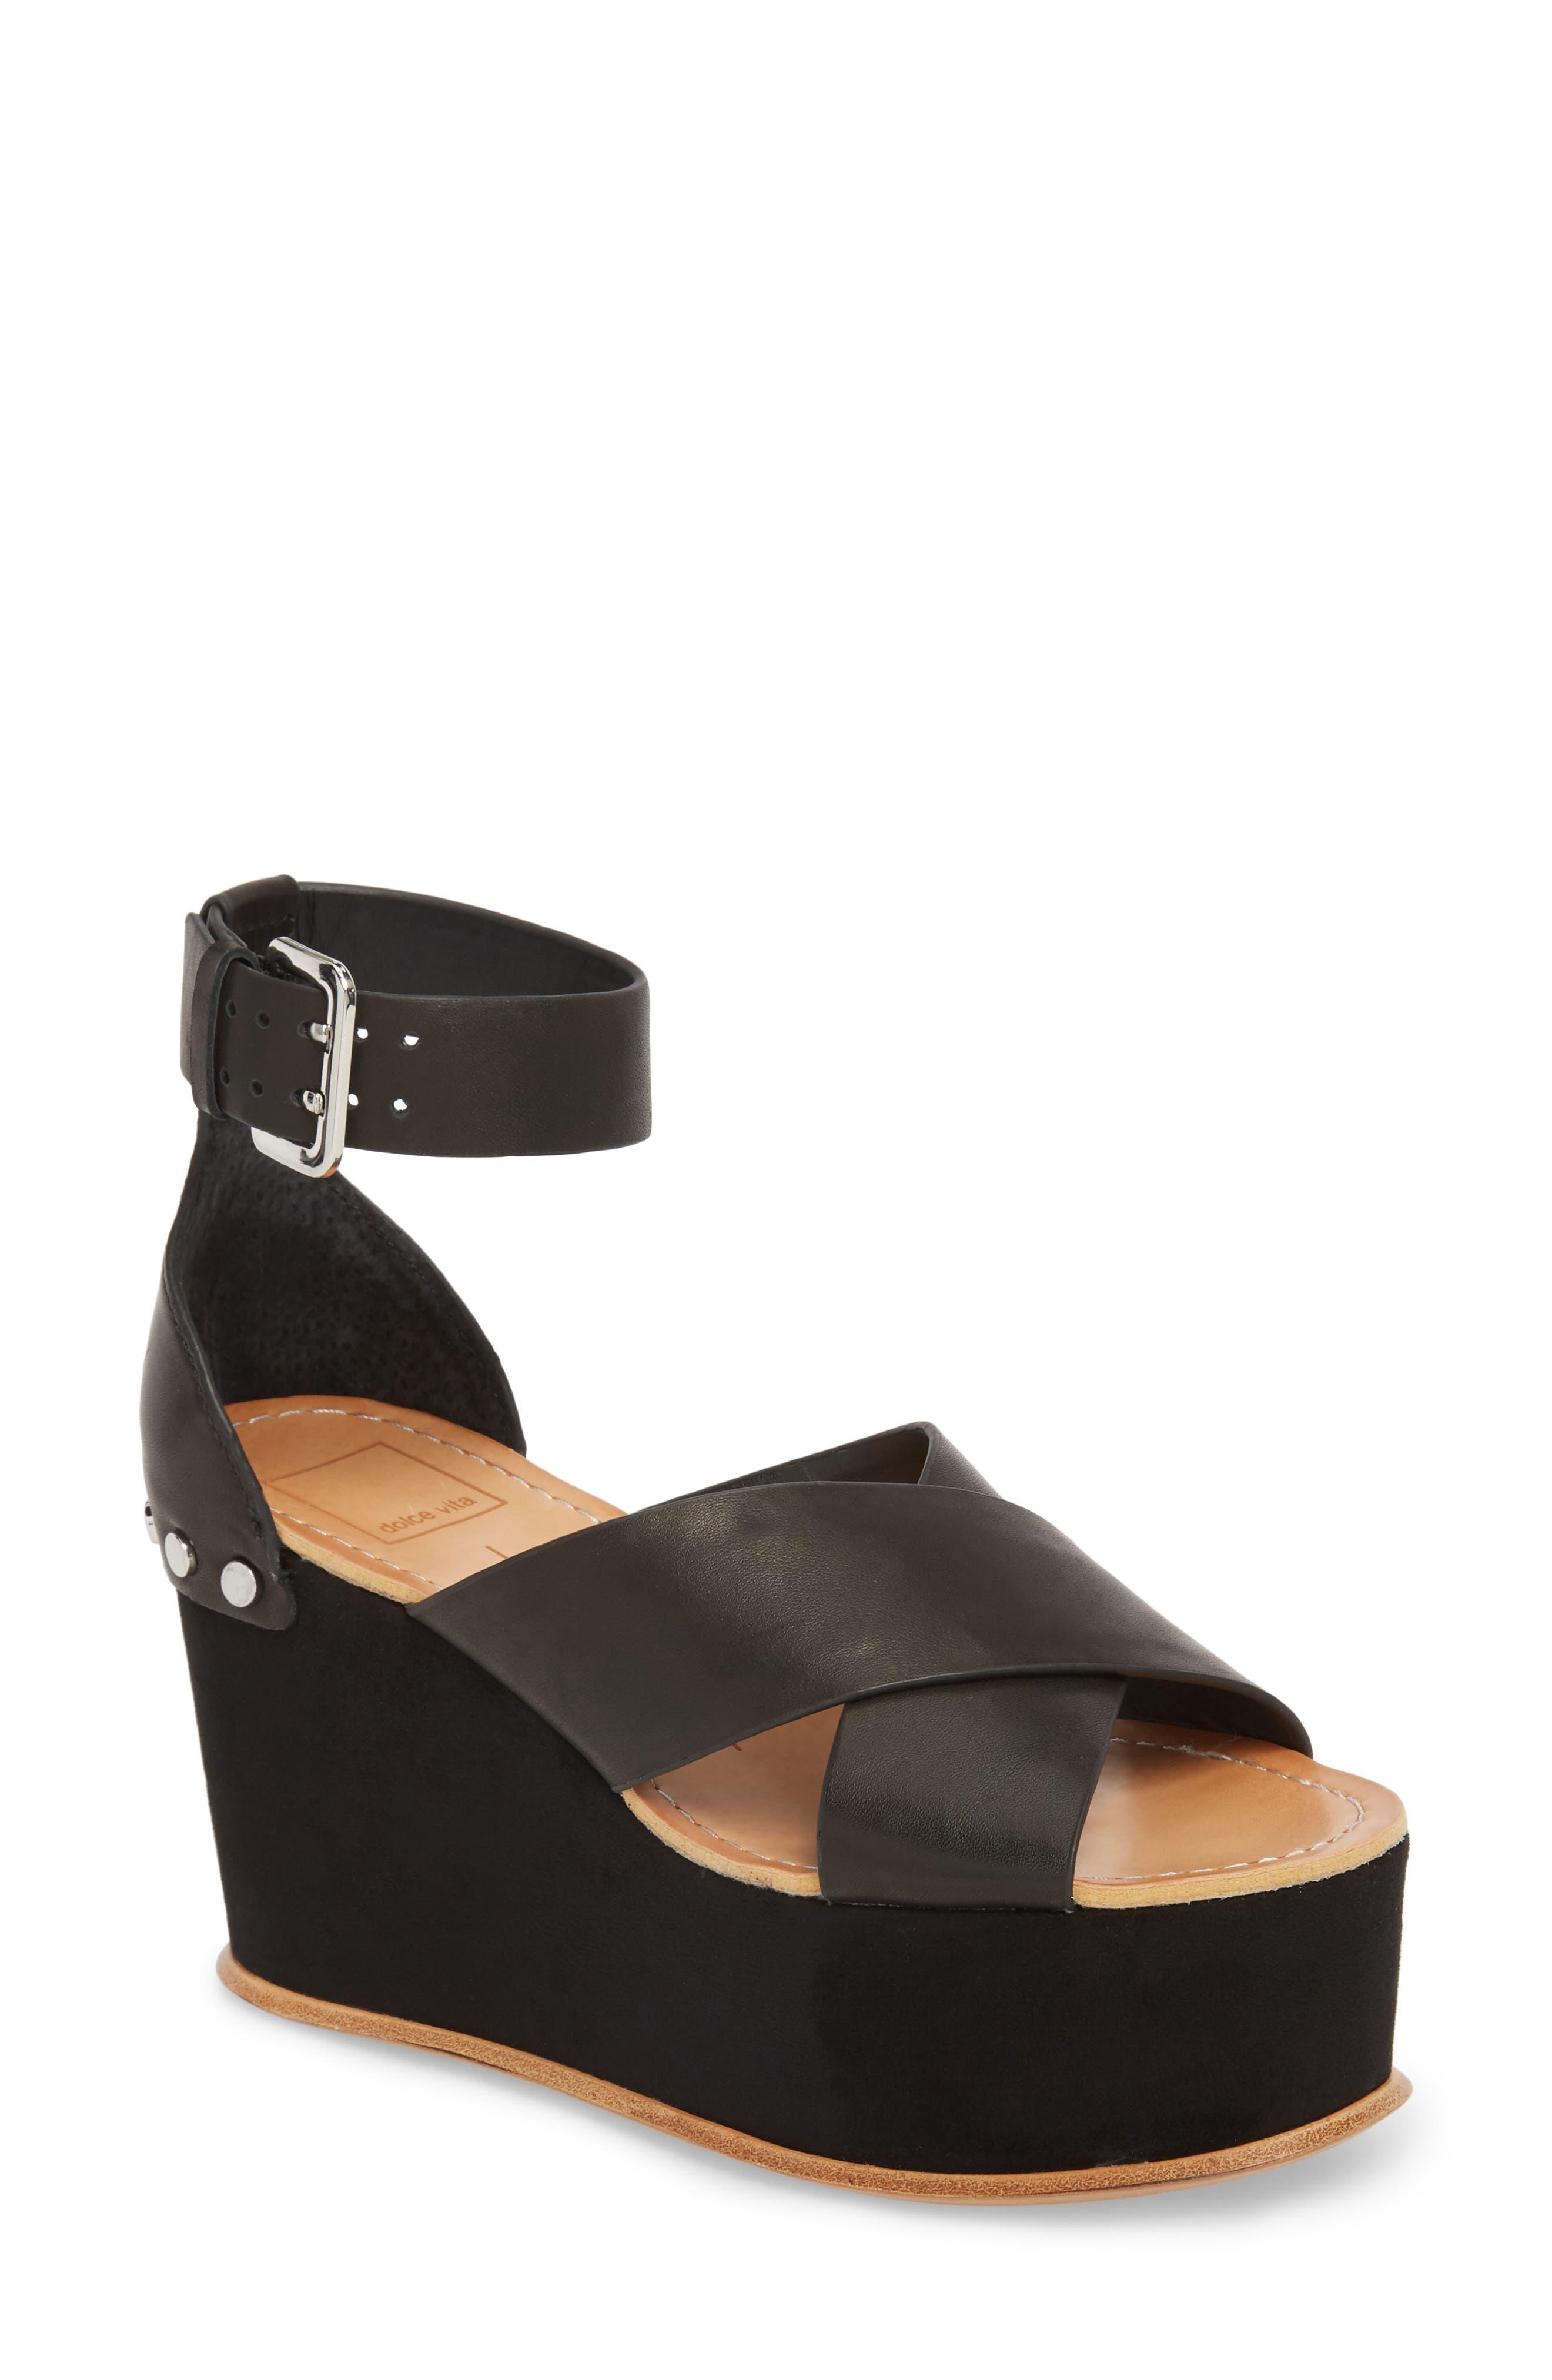 DOLCE VITA Dalrae Platform Wedge Sandal, Main, color, 001